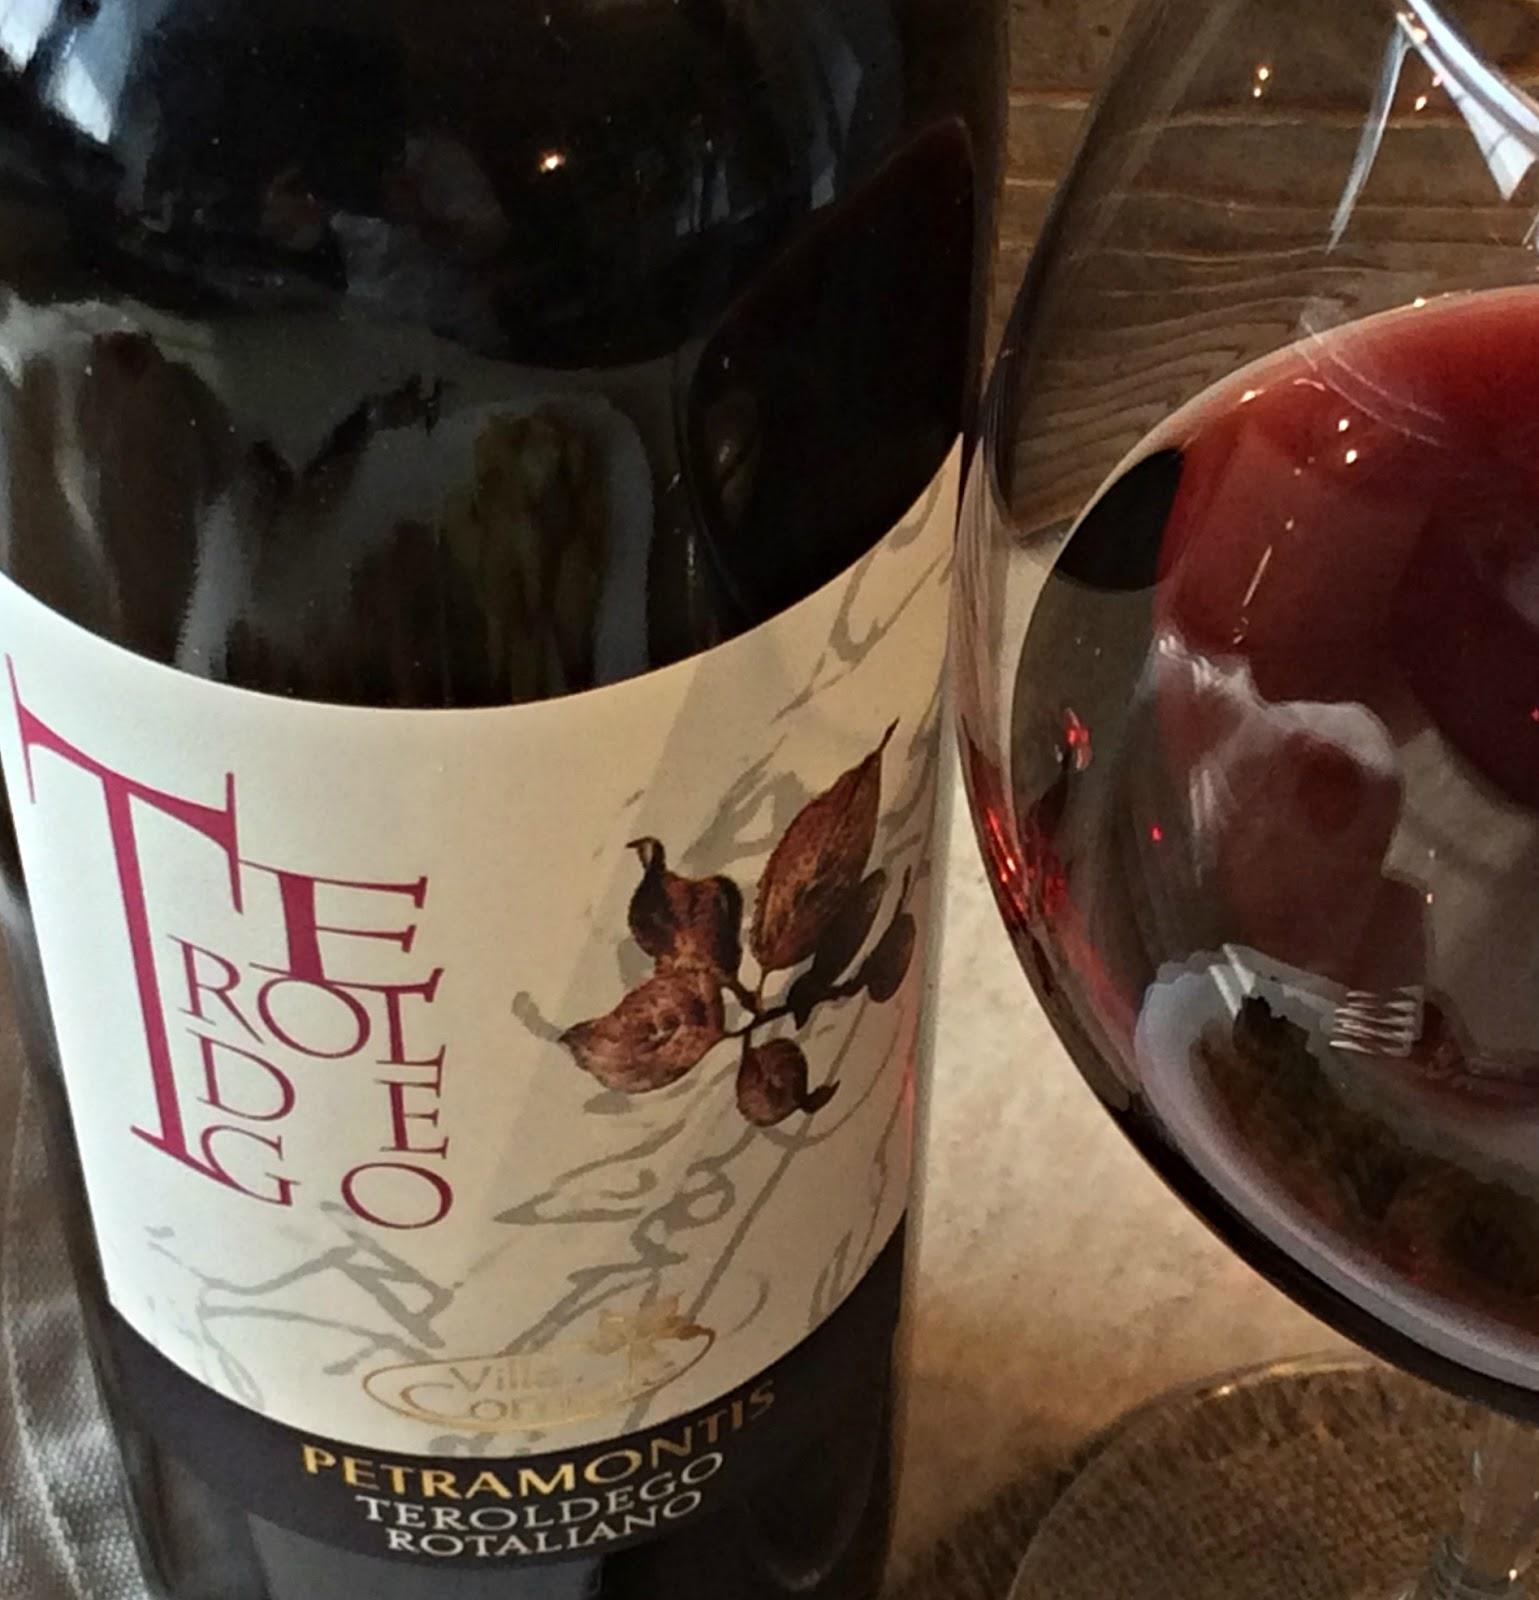 vino trentino teroldego rotaliano petramontis